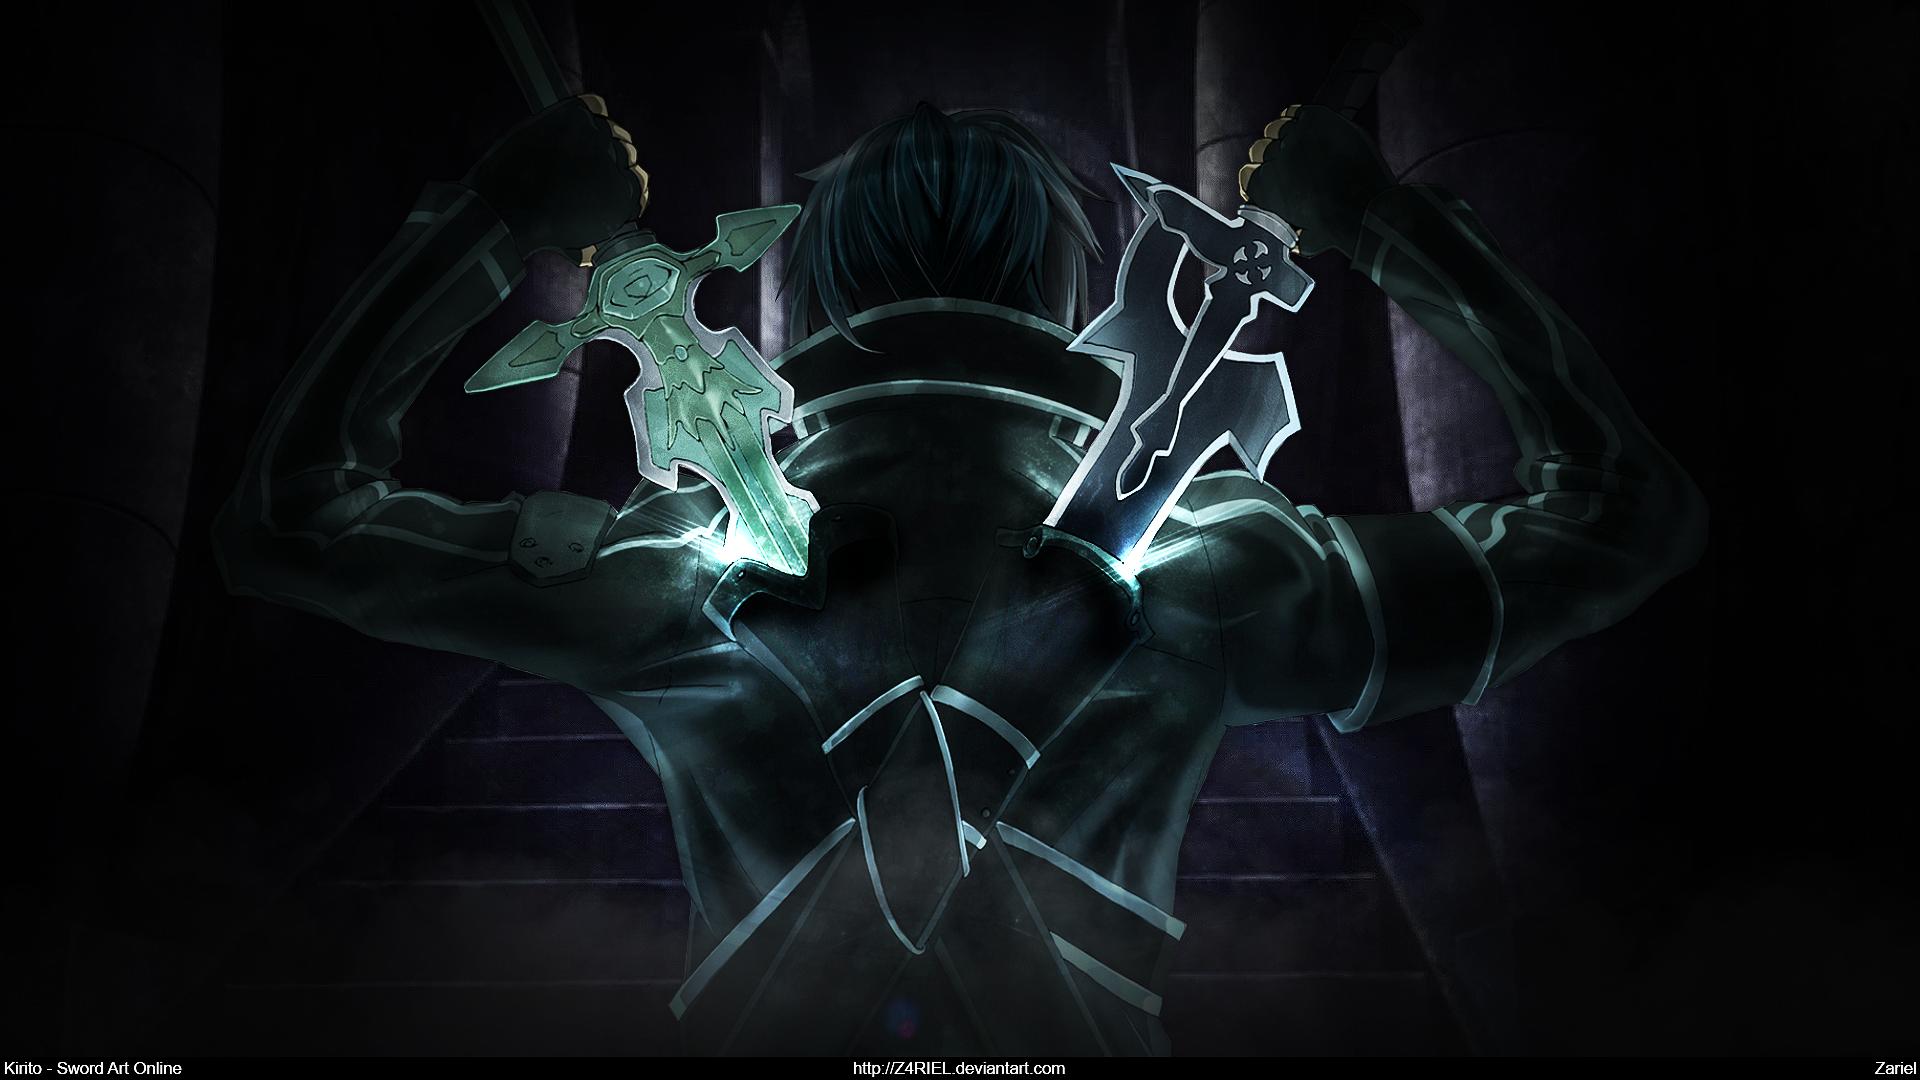 Sword Art Online Kirito Dual Blades Wallpaper By Z4riel On Deviantart